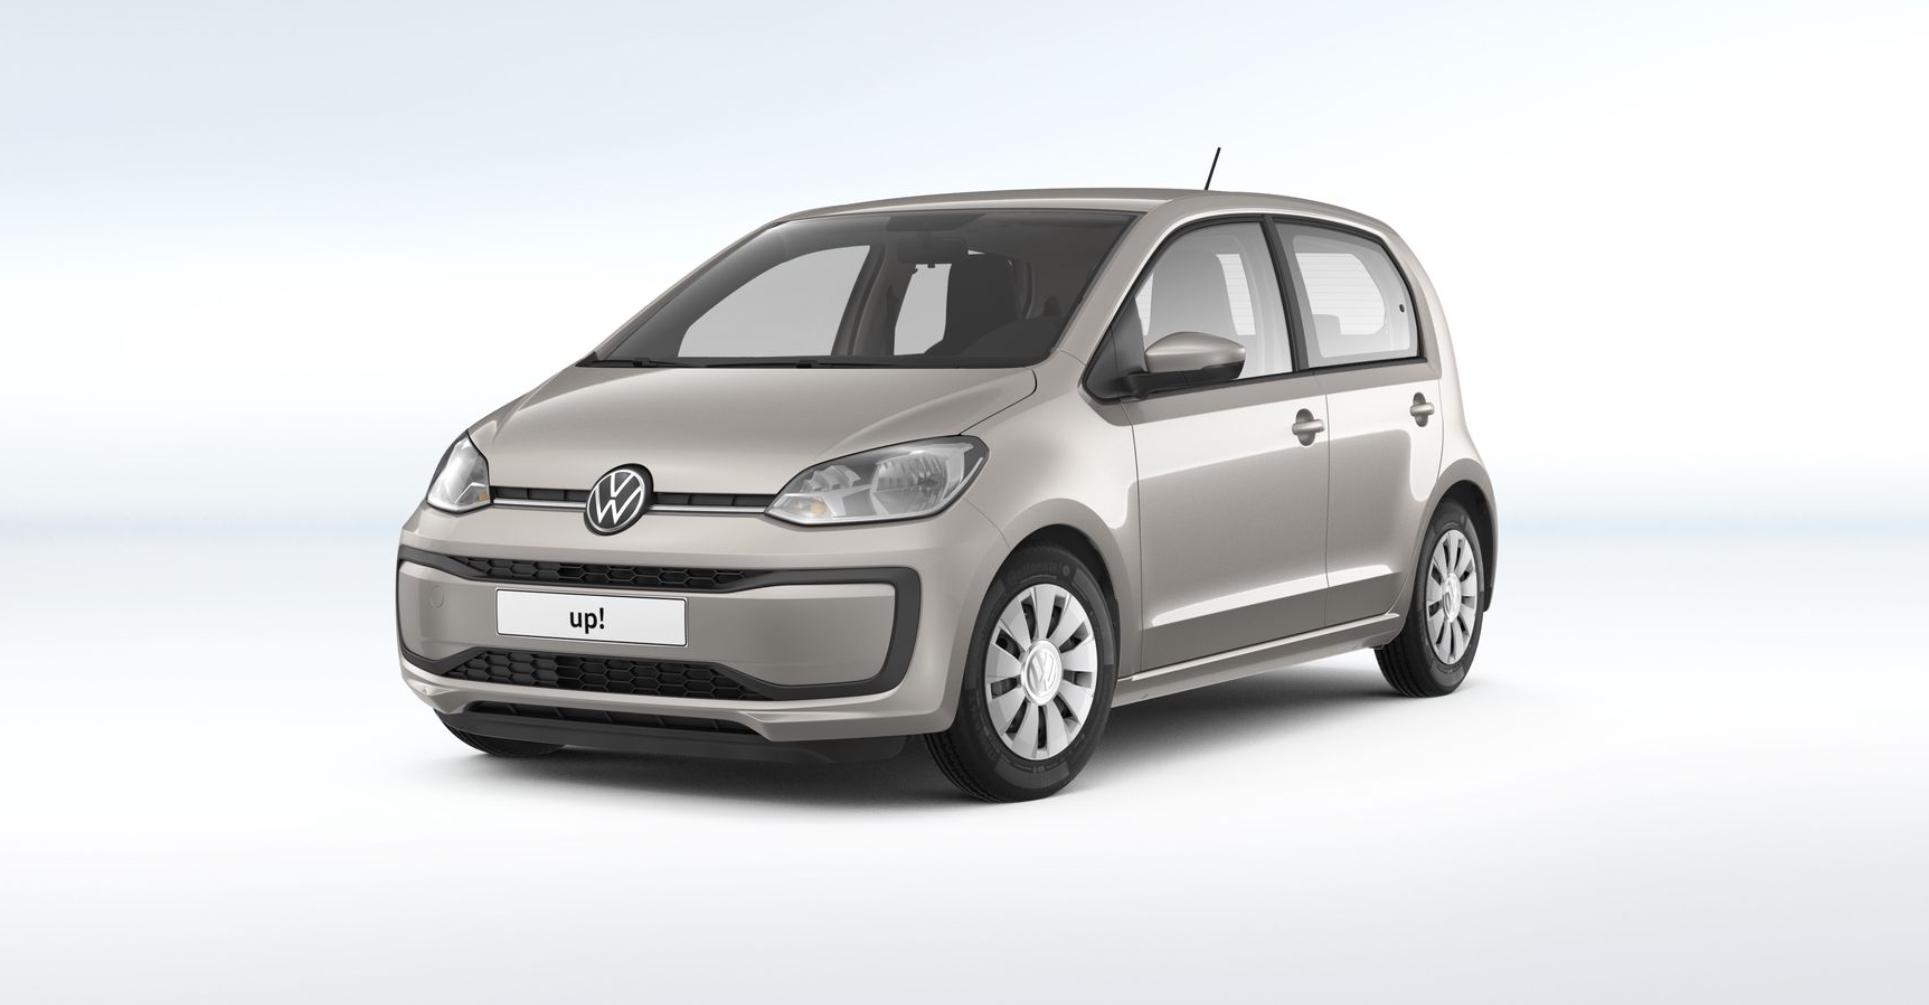 Volkswagen up! Occasion 241.00 image